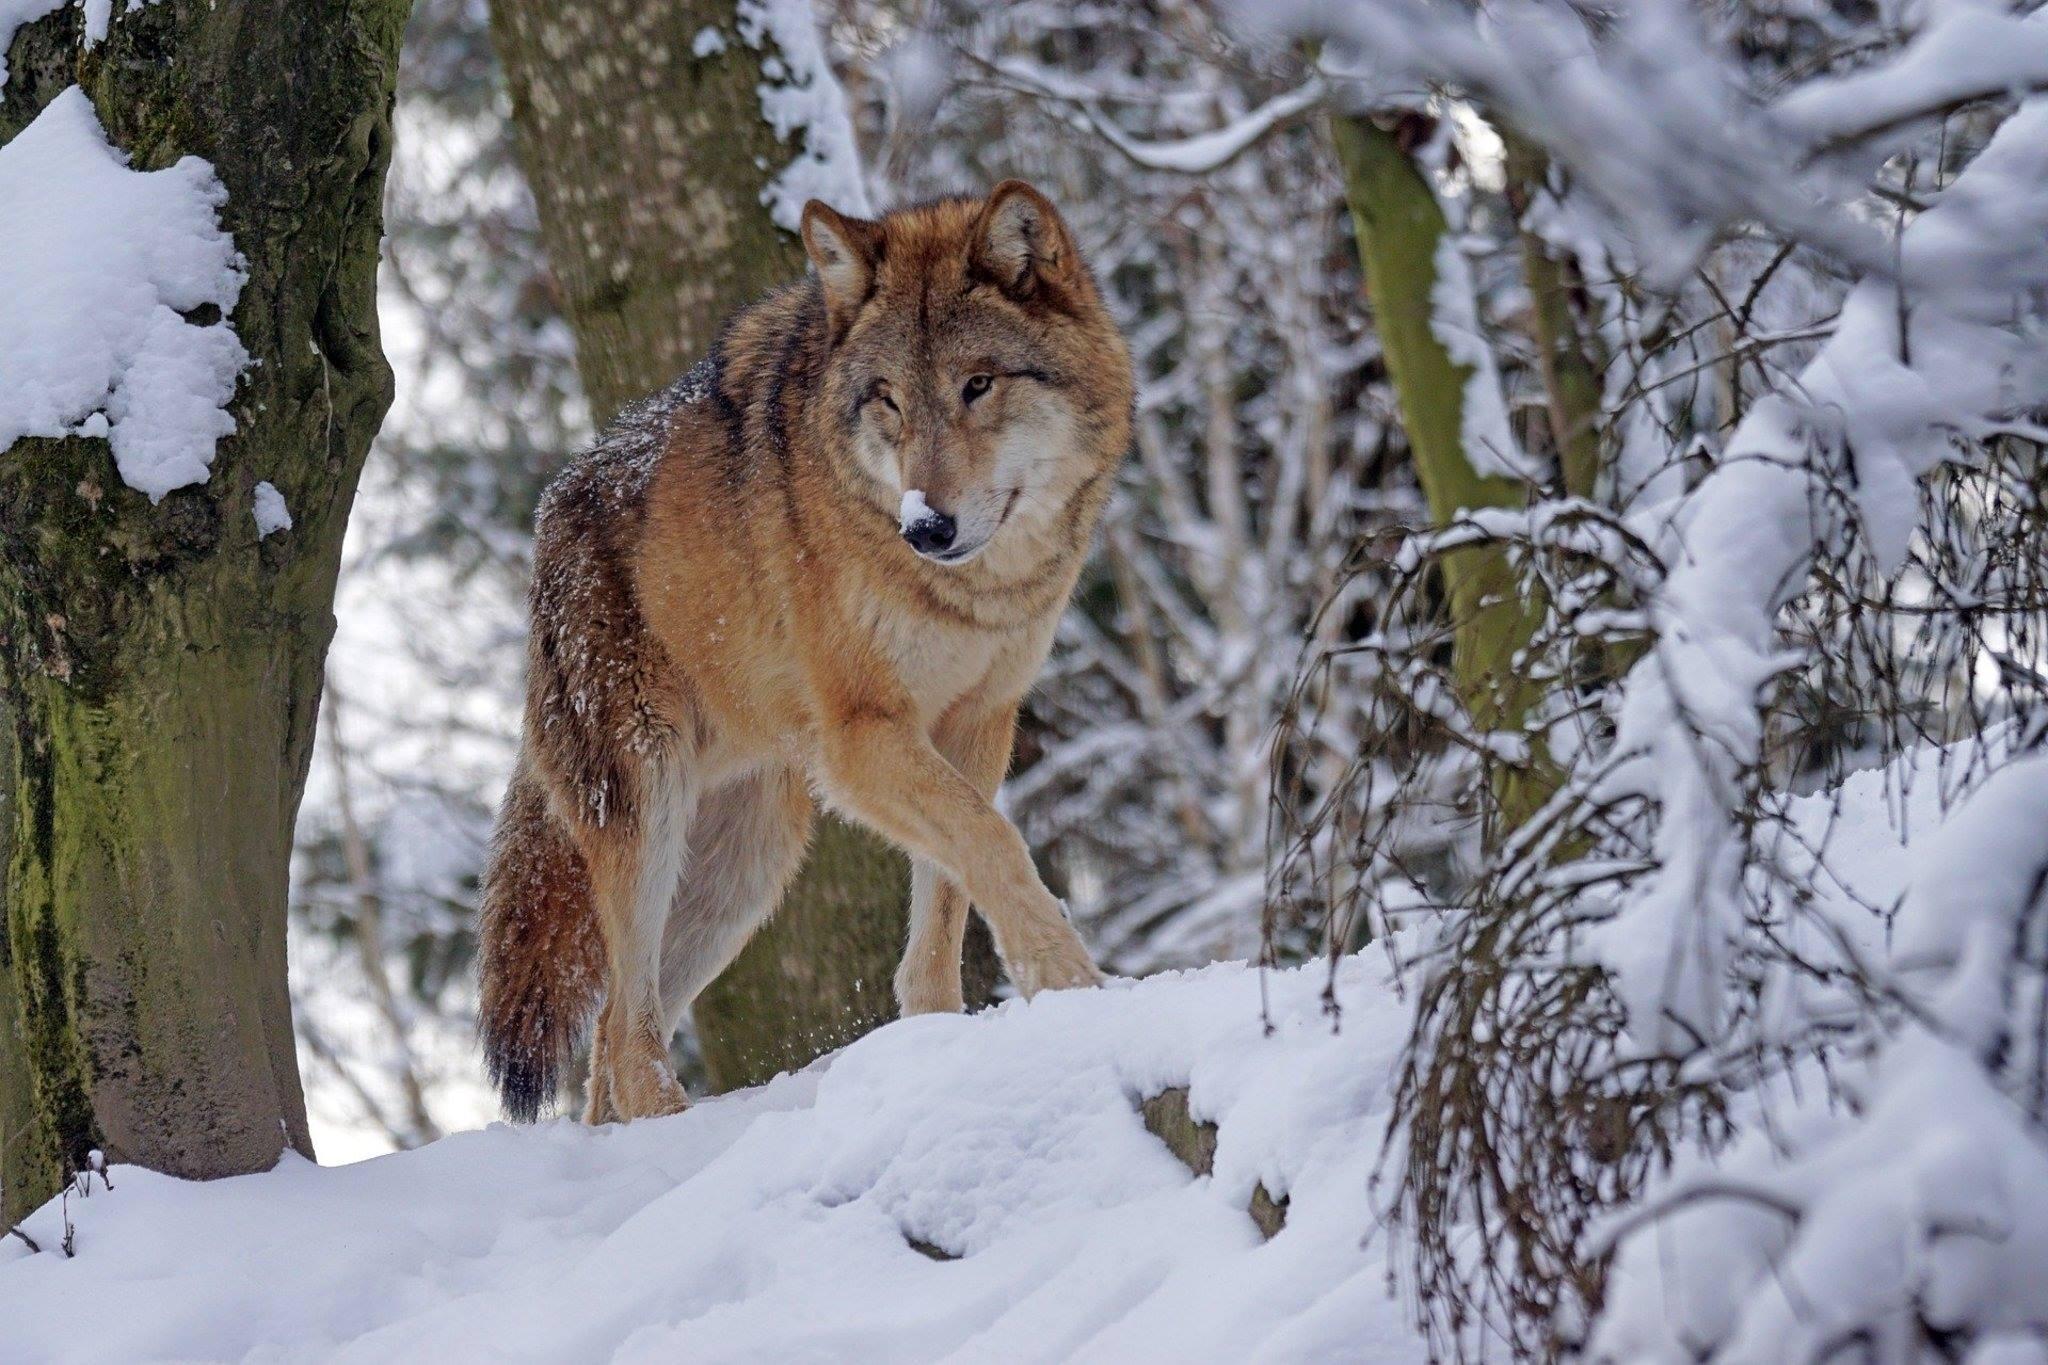 winter wolf snow trees animal